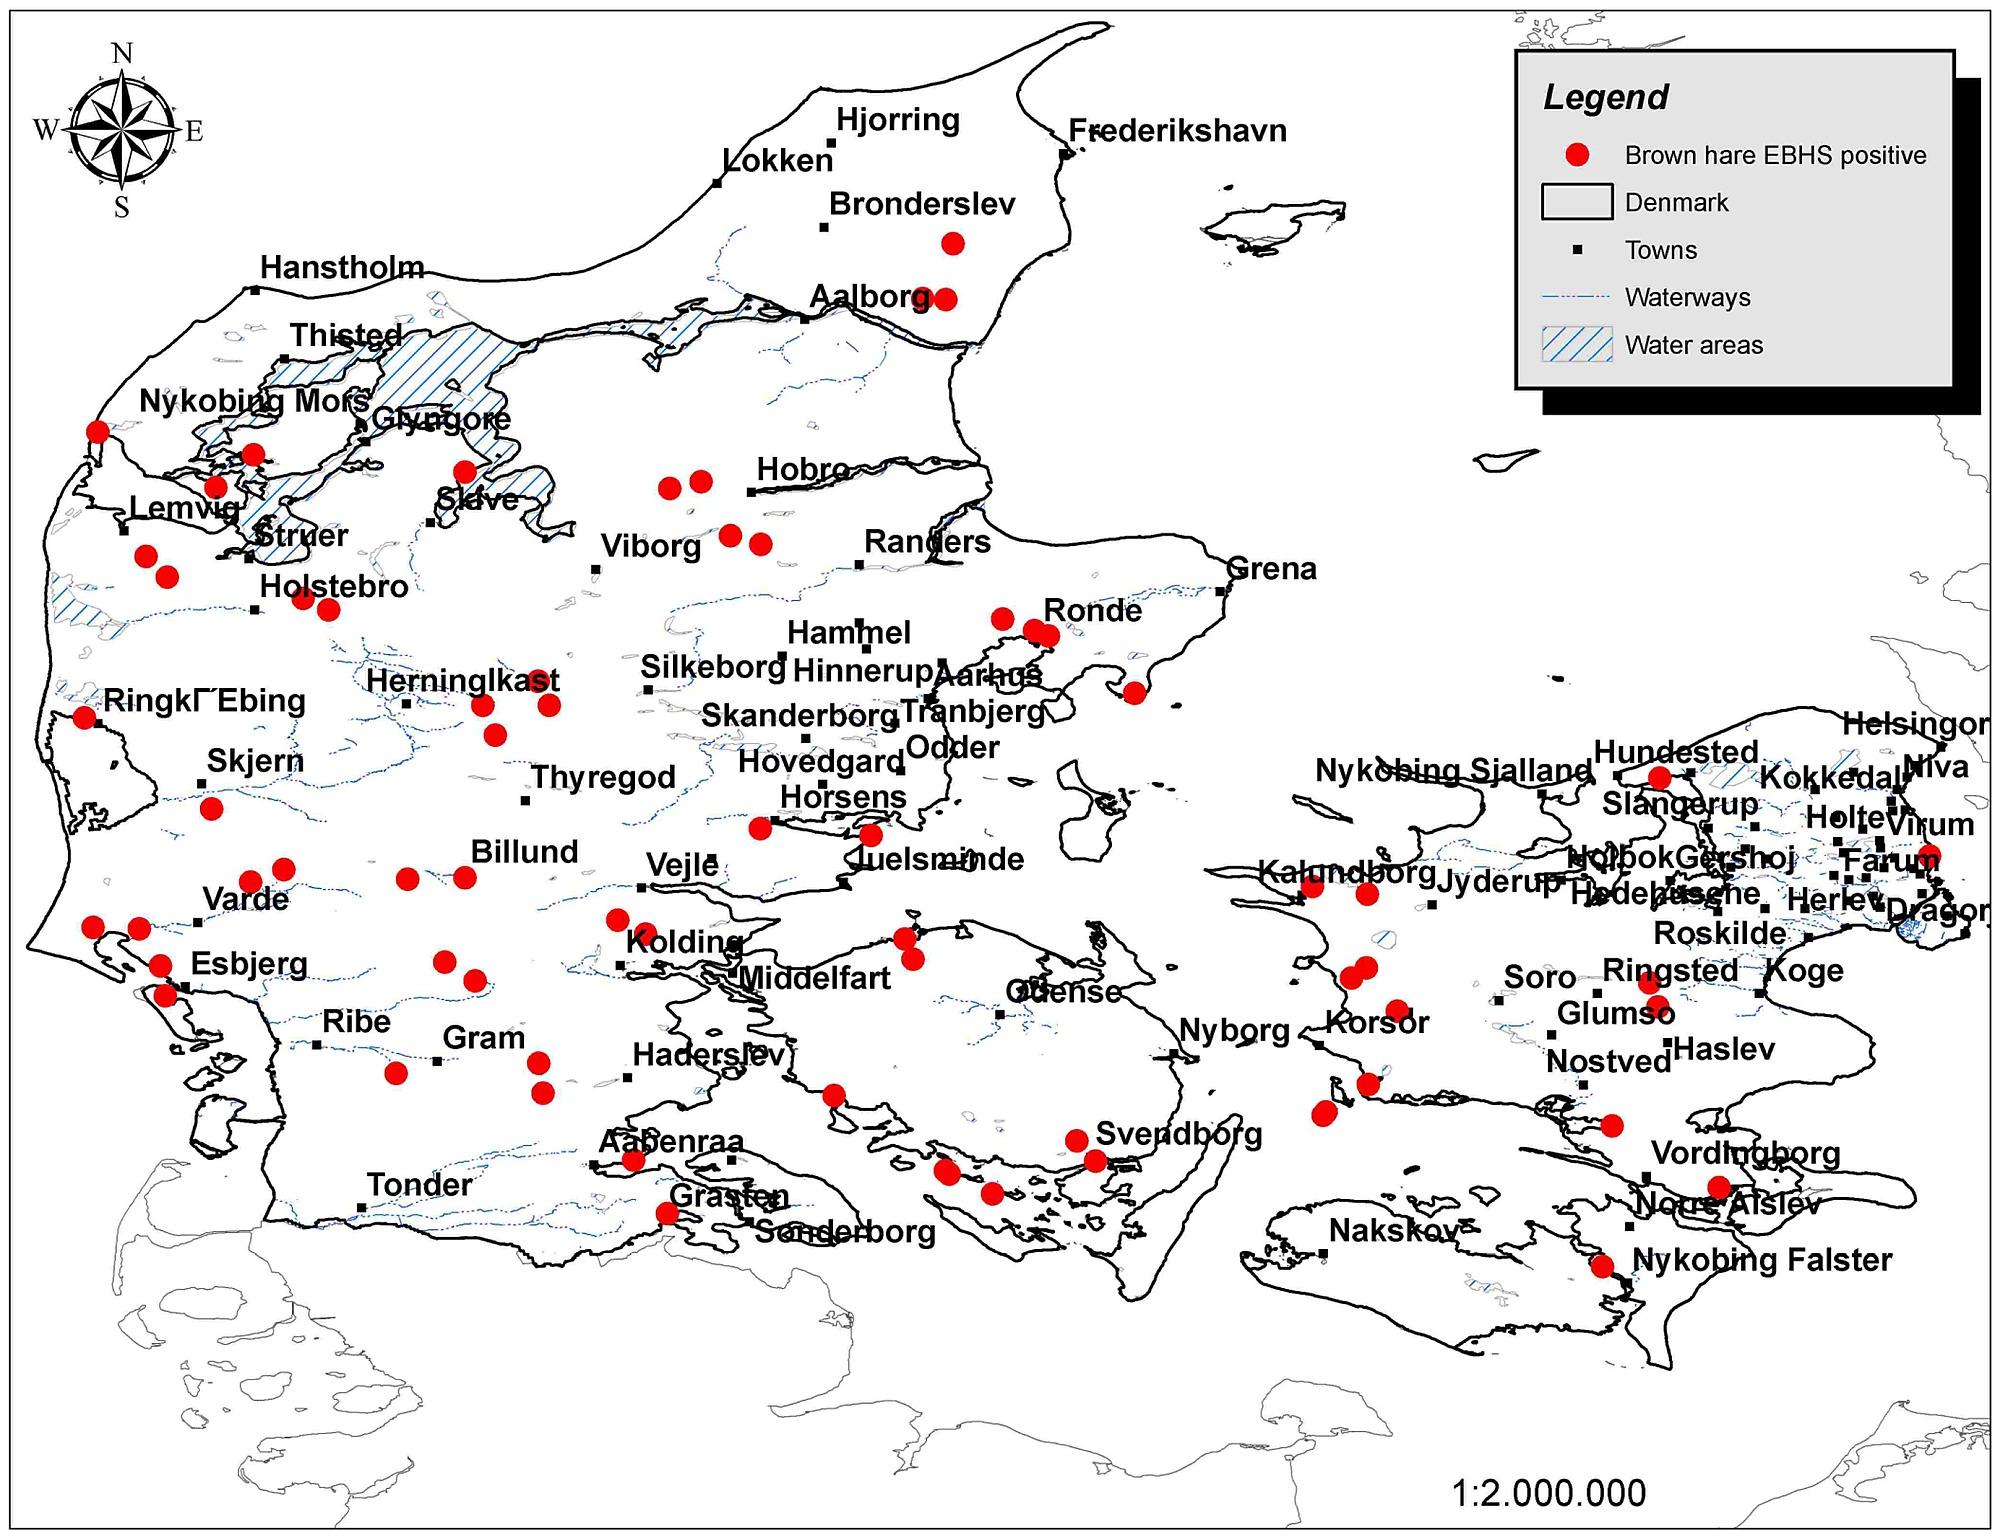 Location map of EBHSV positive Lepus europaeus individuals.